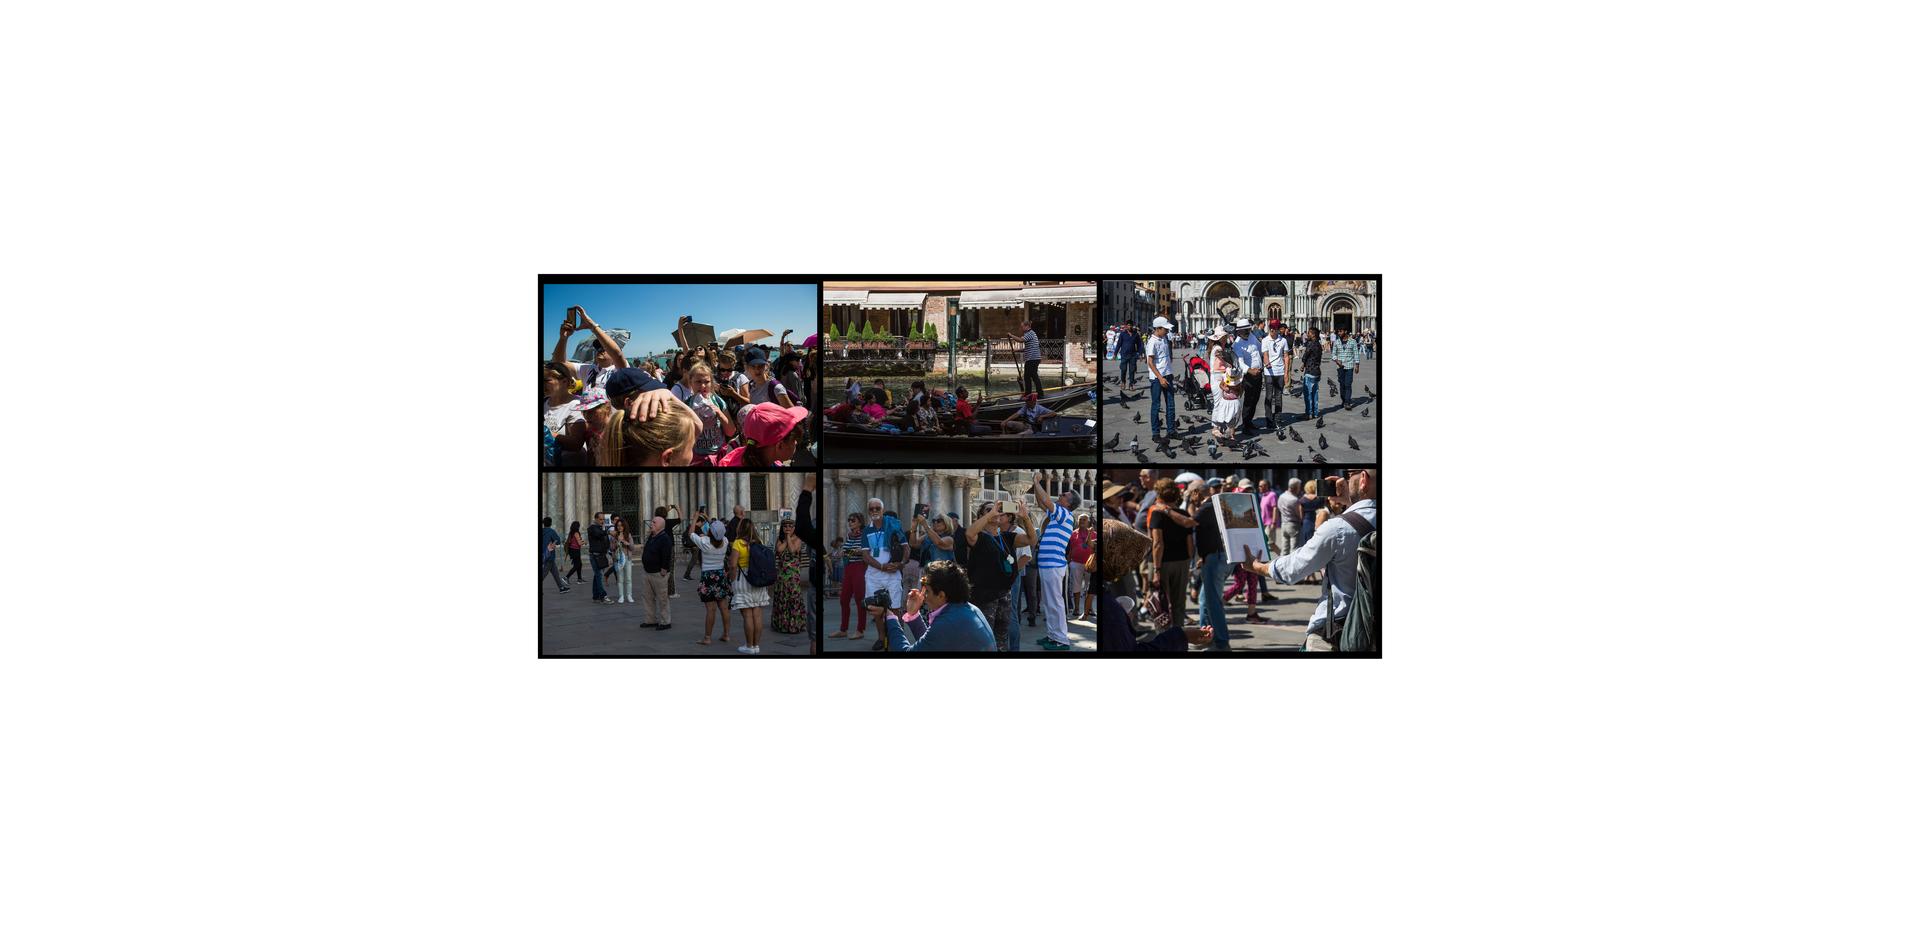 Turismo de massa  2018 / 2019